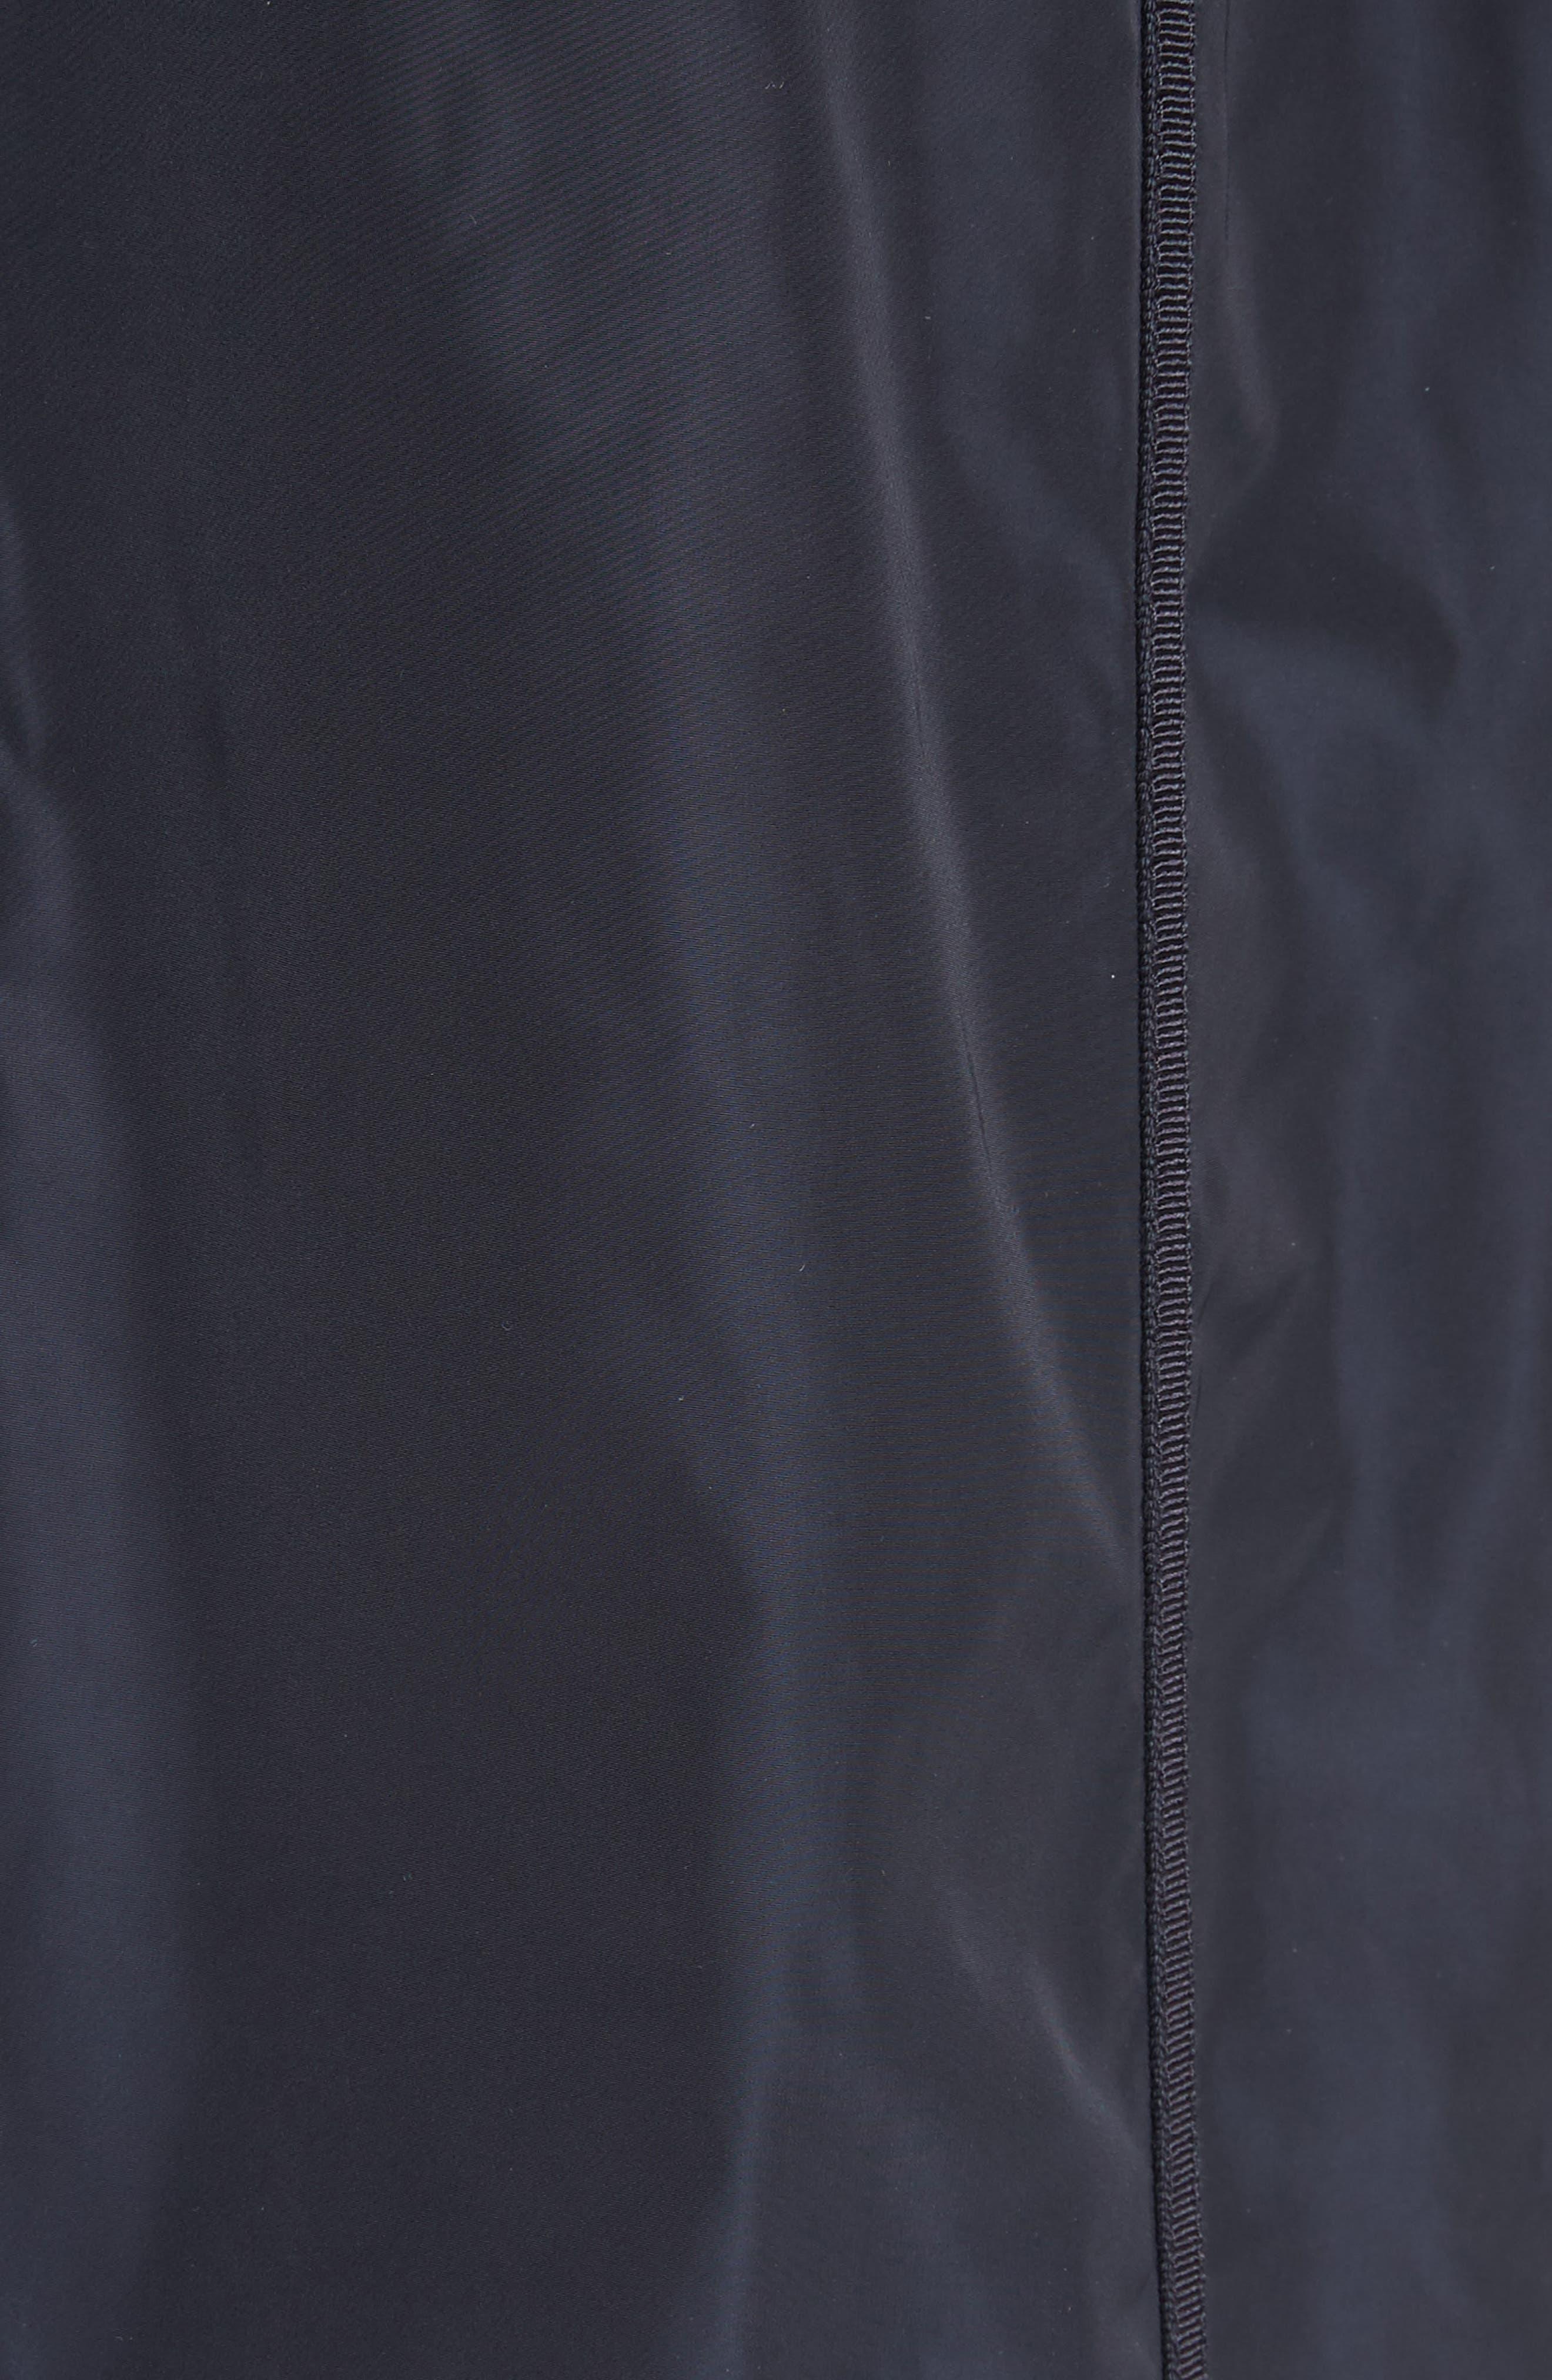 Anthemis Rain Coat,                             Alternate thumbnail 6, color,                             NAVY